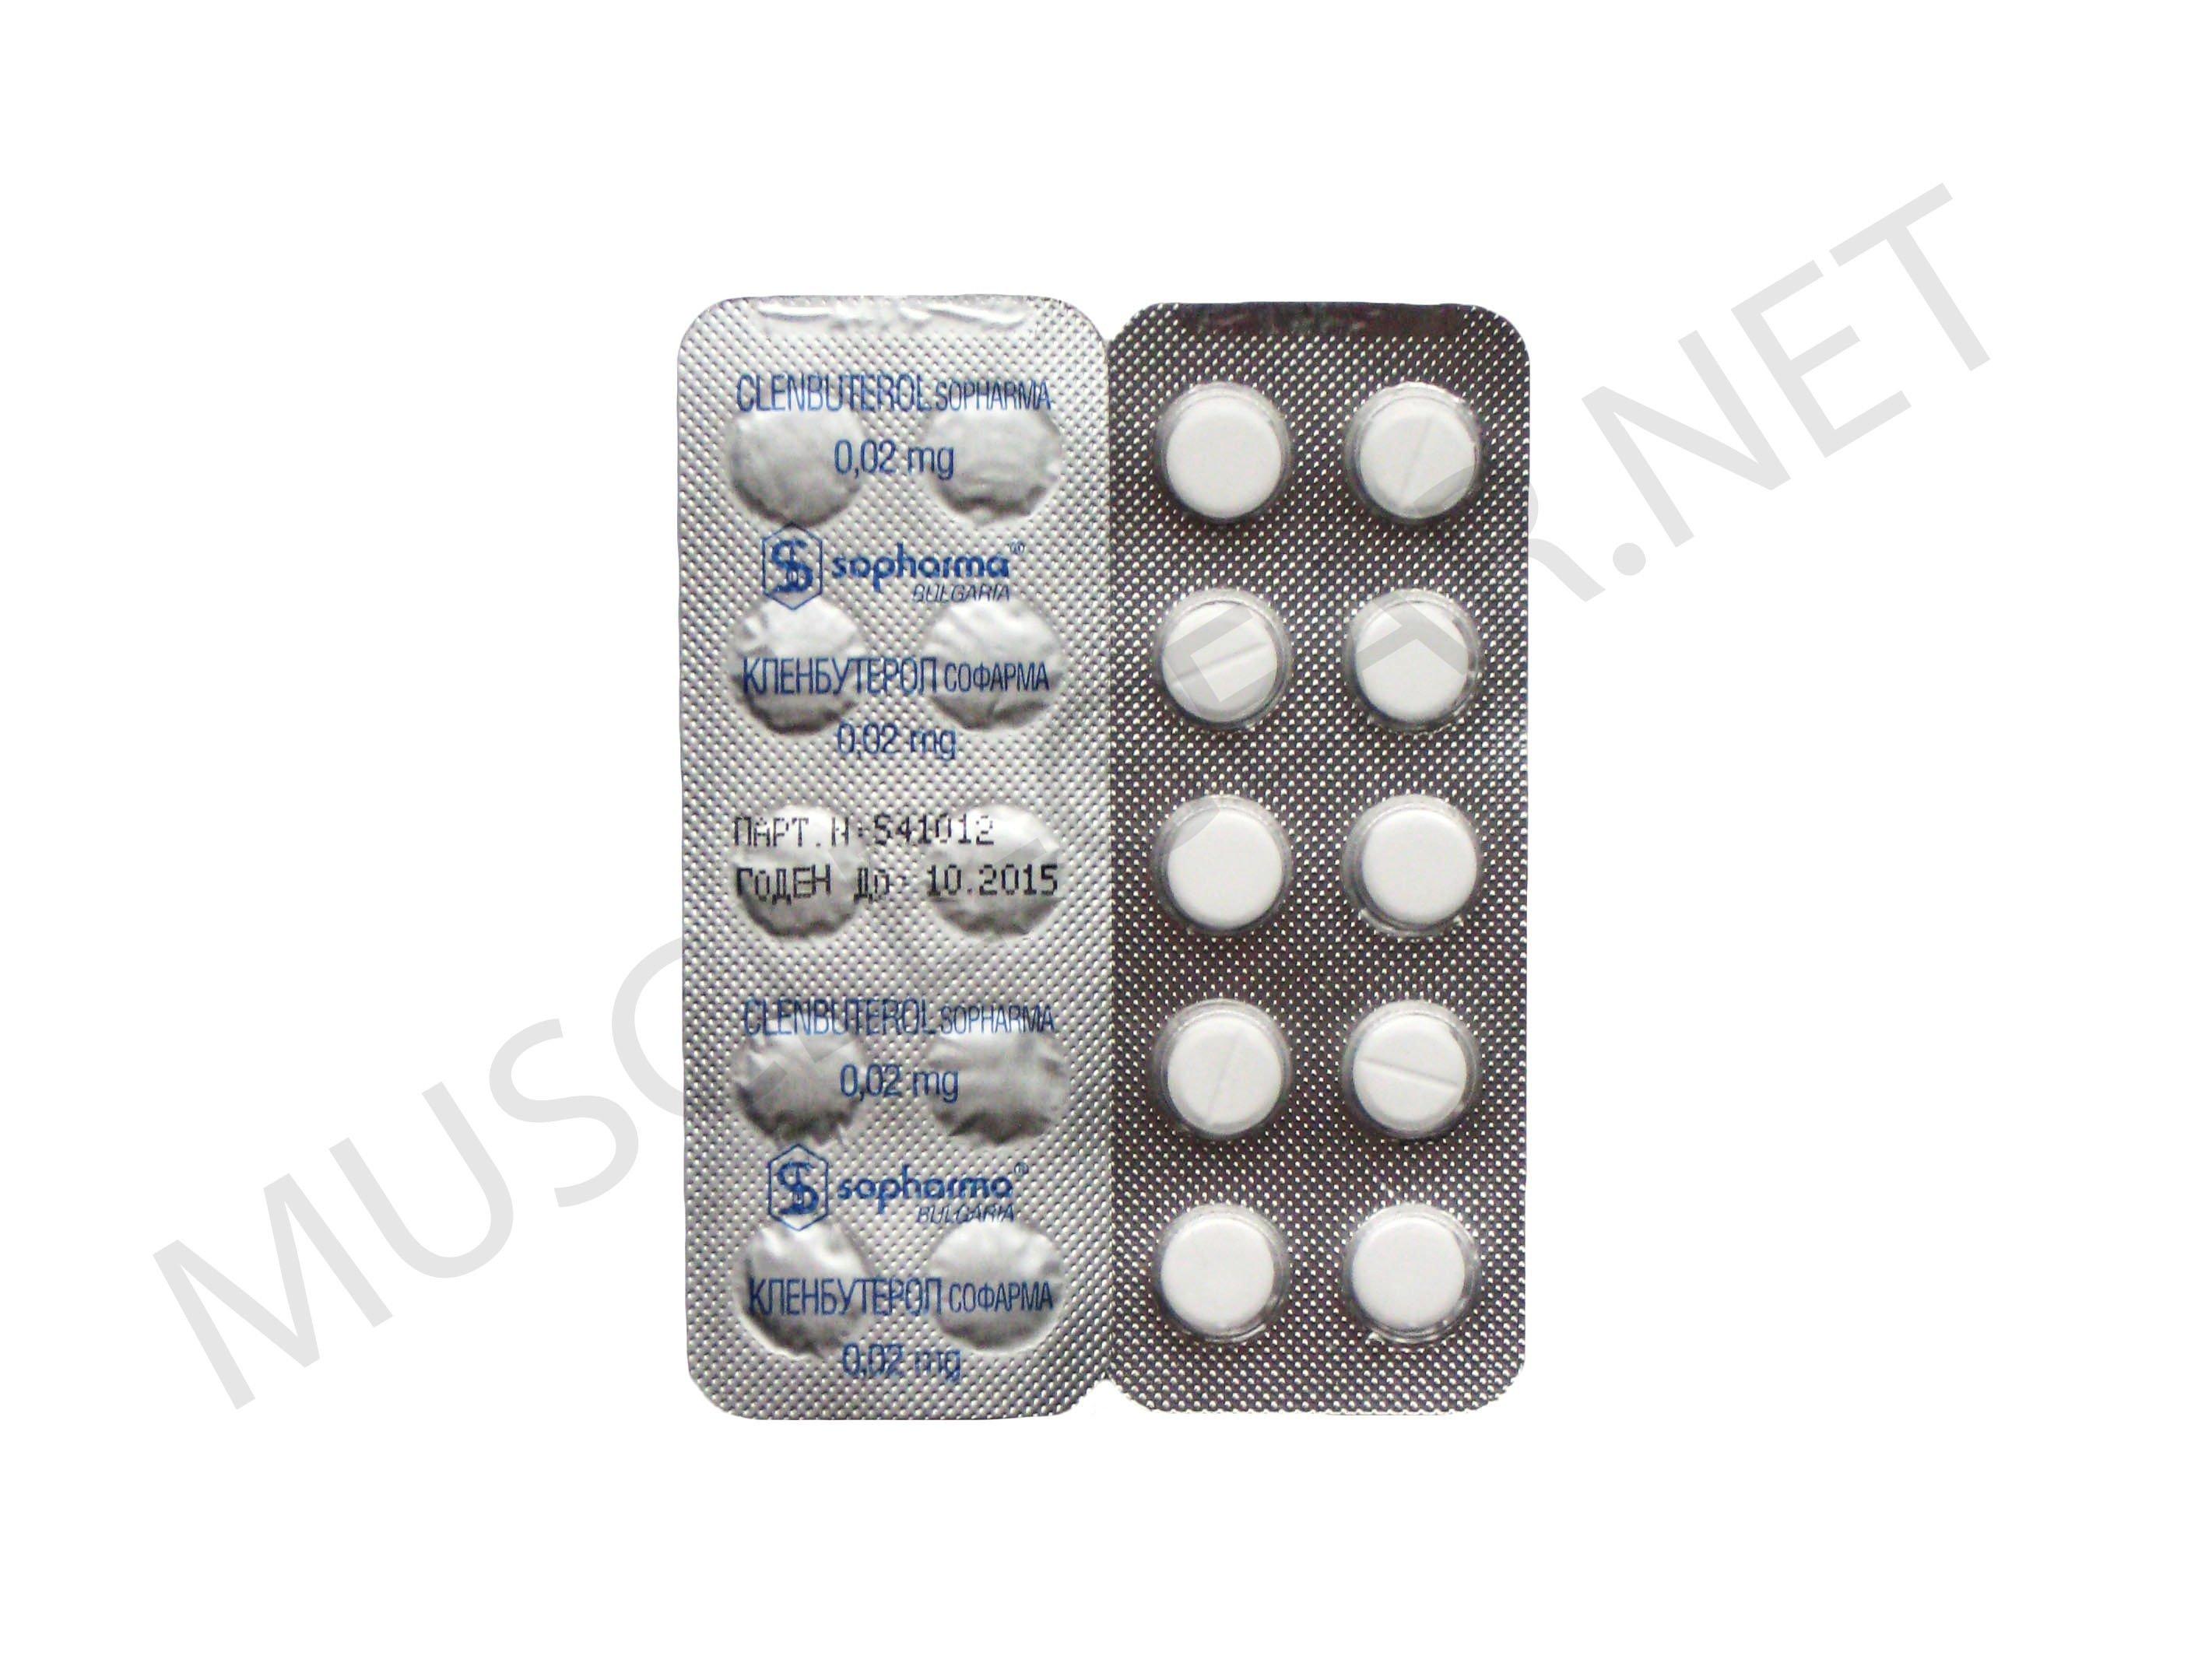 Pharmacy human grade Clen (Clenbuterol) Tablets | Muscle